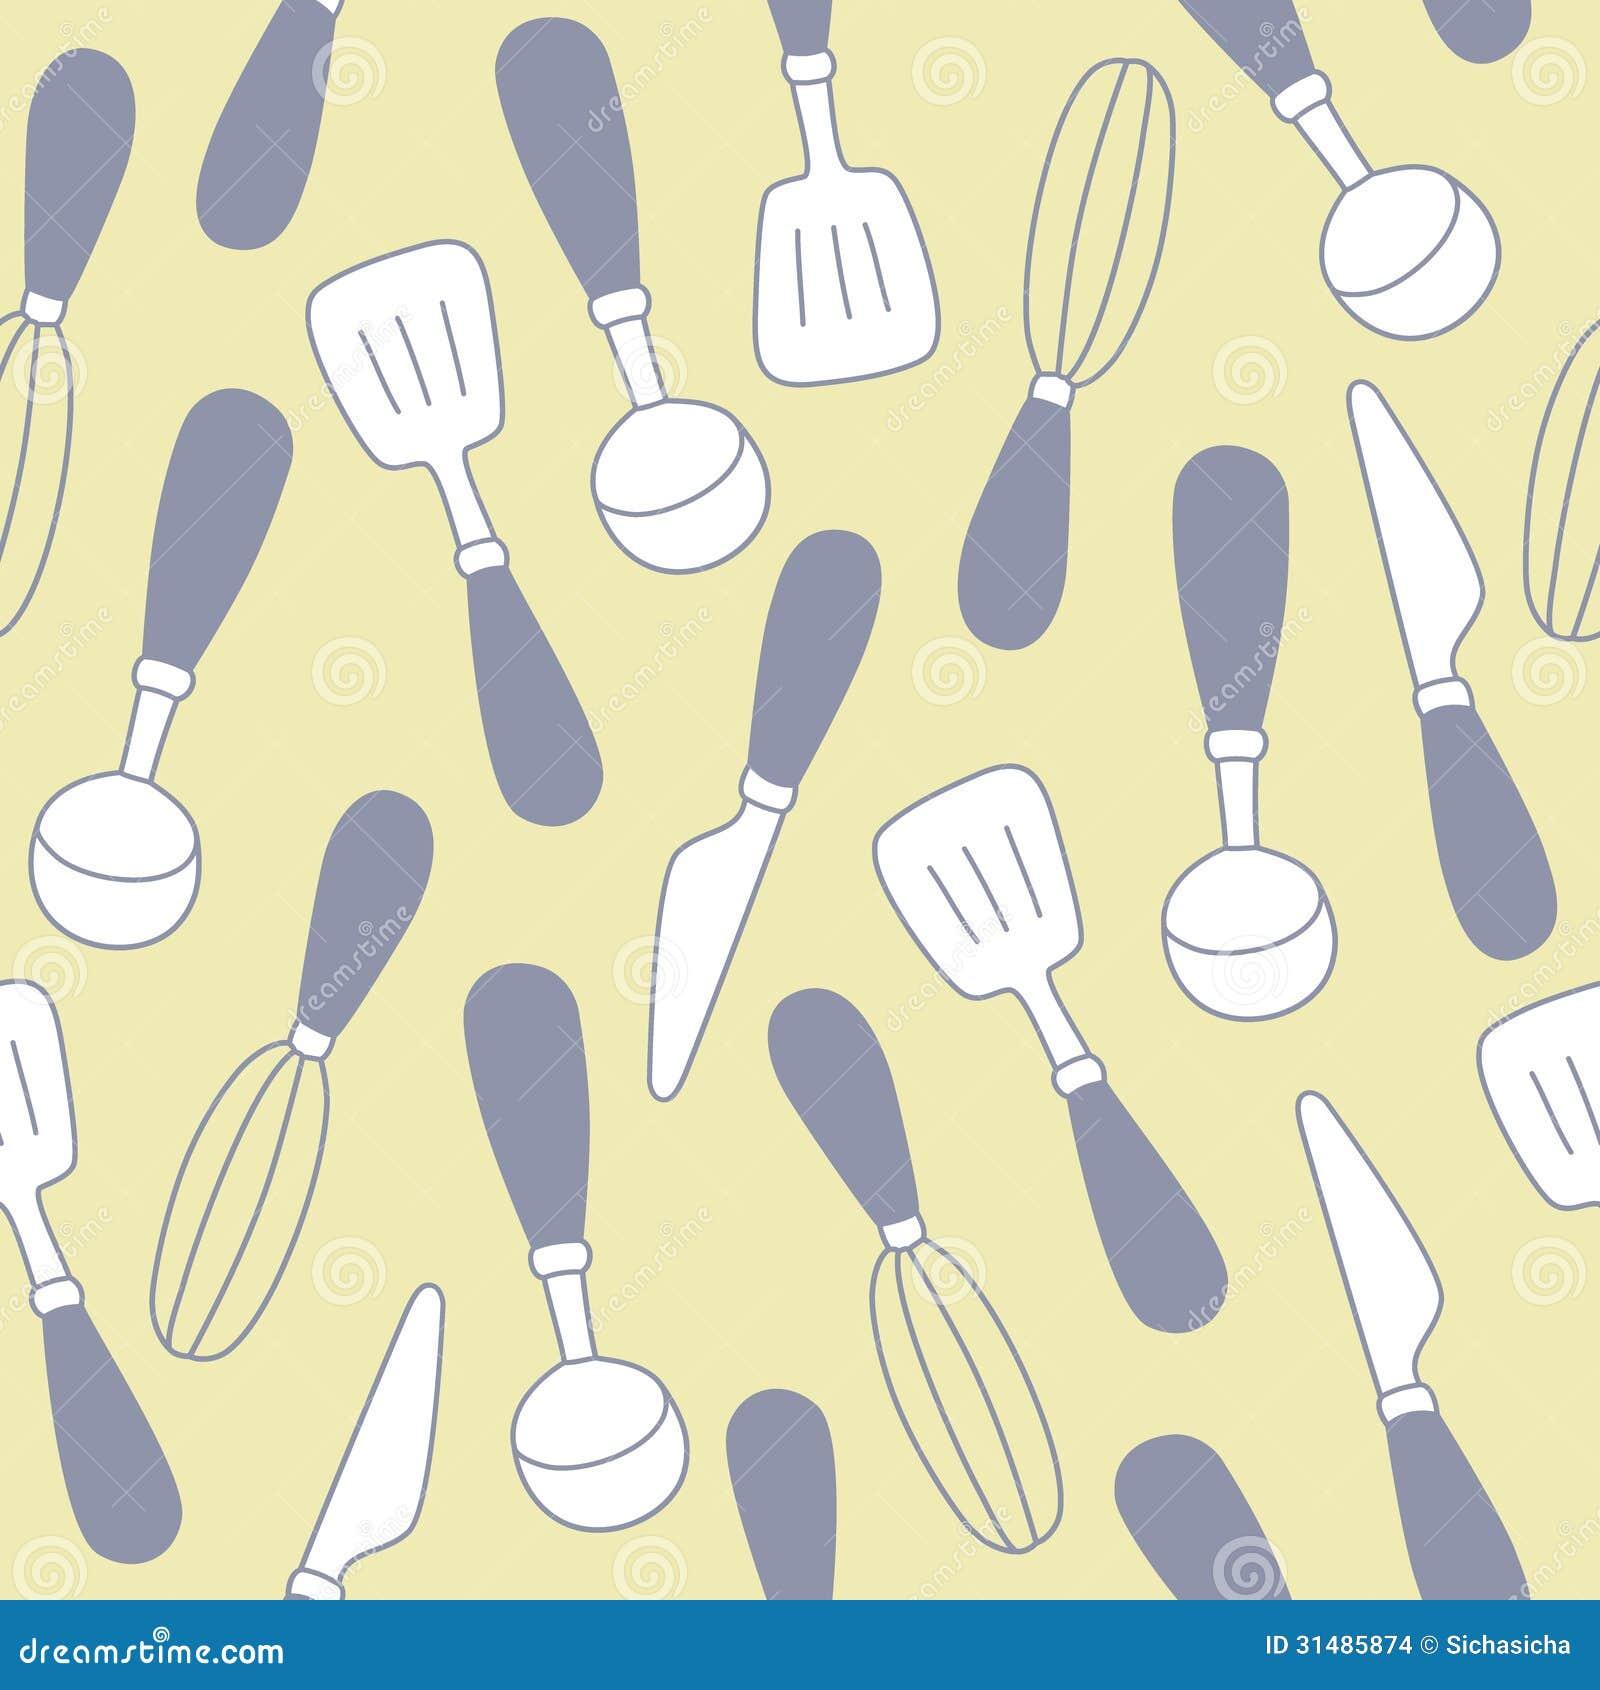 kitchen utensils background kitchenware kitchen utensils background stock illustrations 7446 illustrations vectors clipart dreamstime